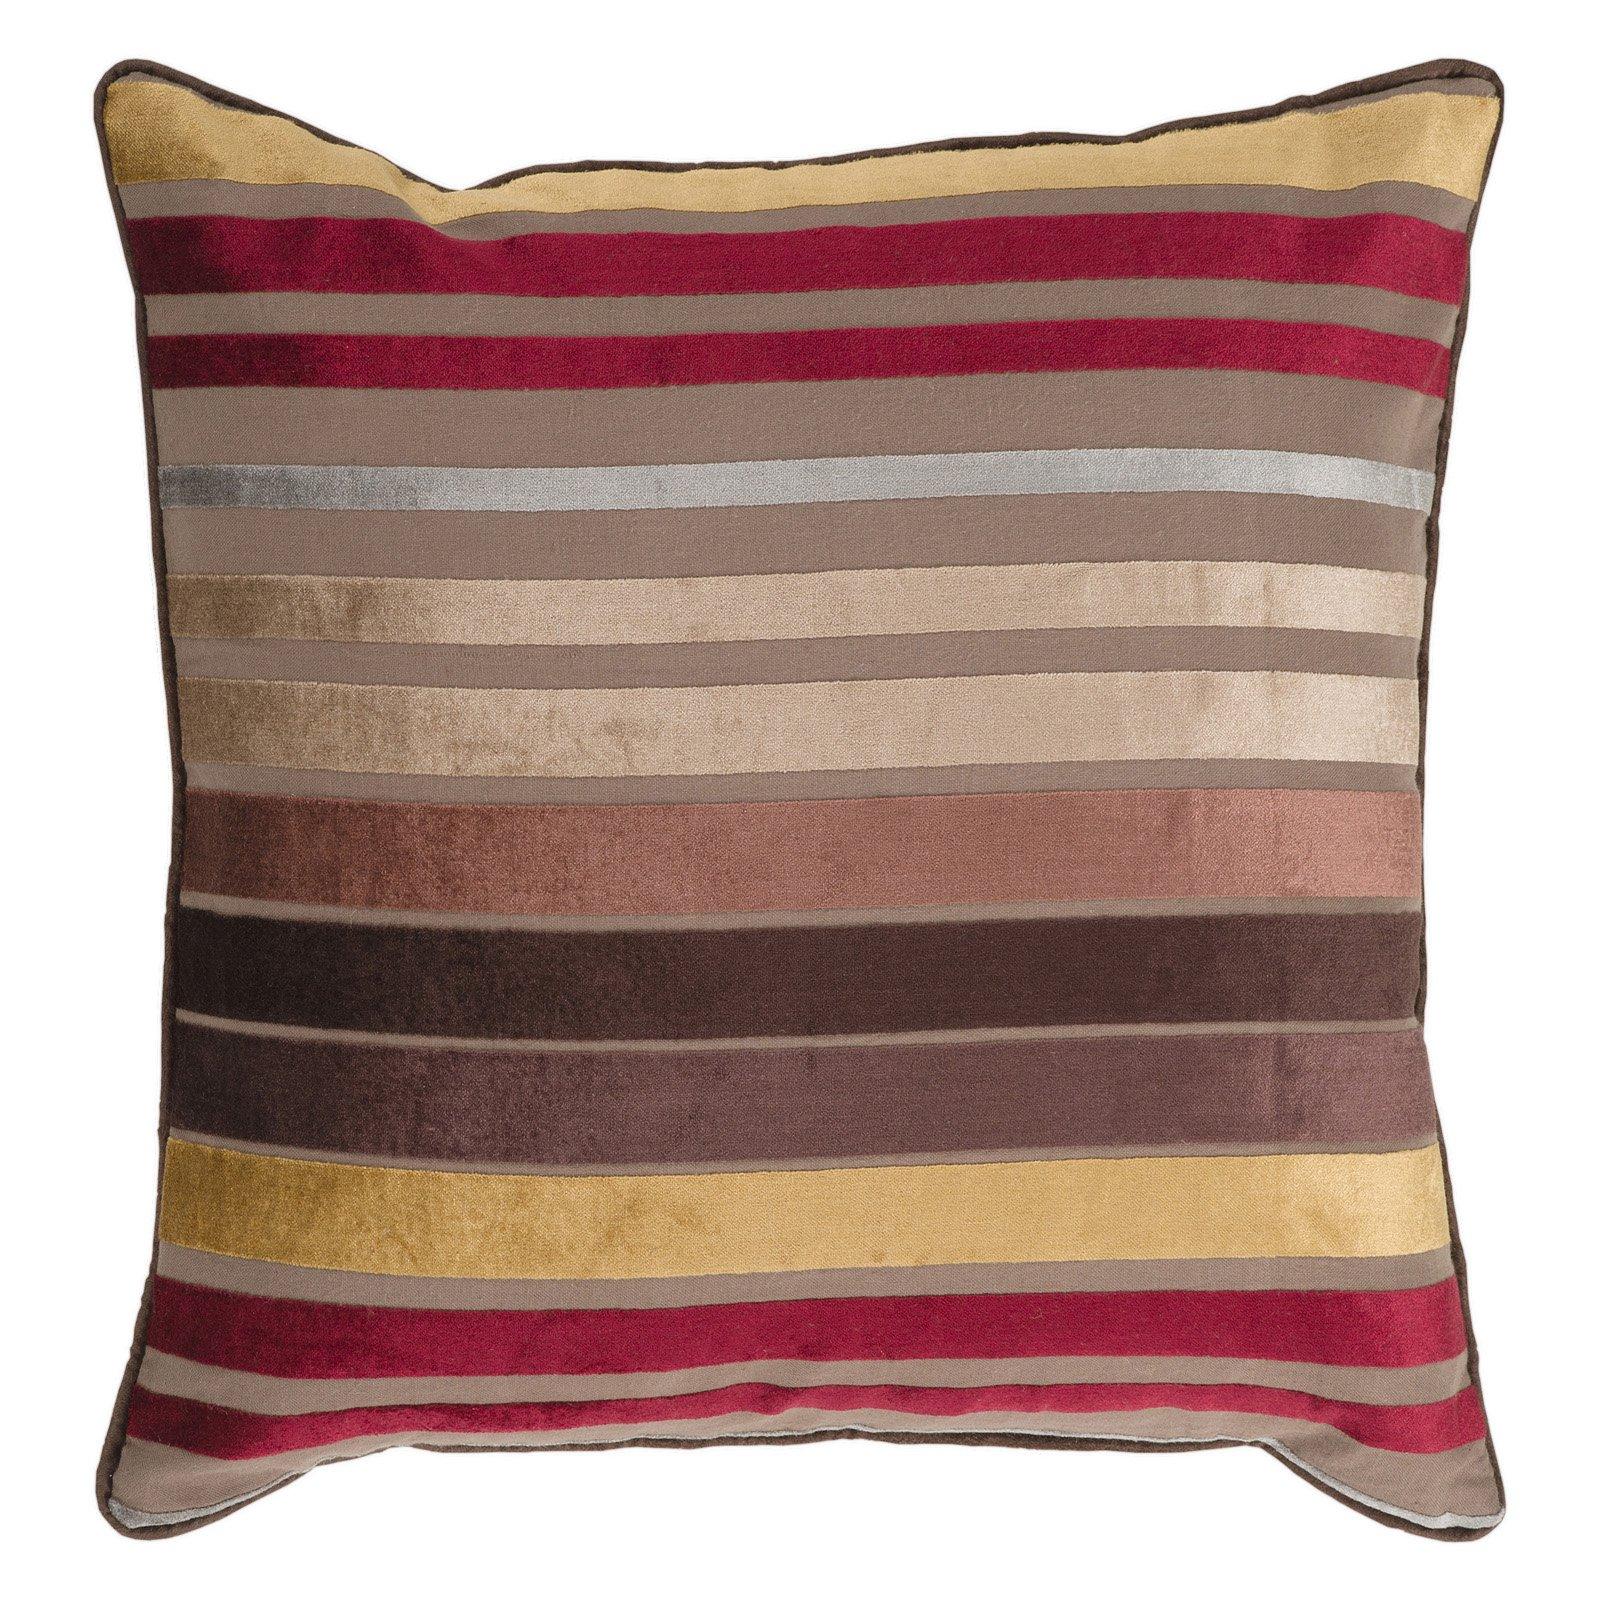 Surya Yarmouth Stripe Decorative Pillow - Brown